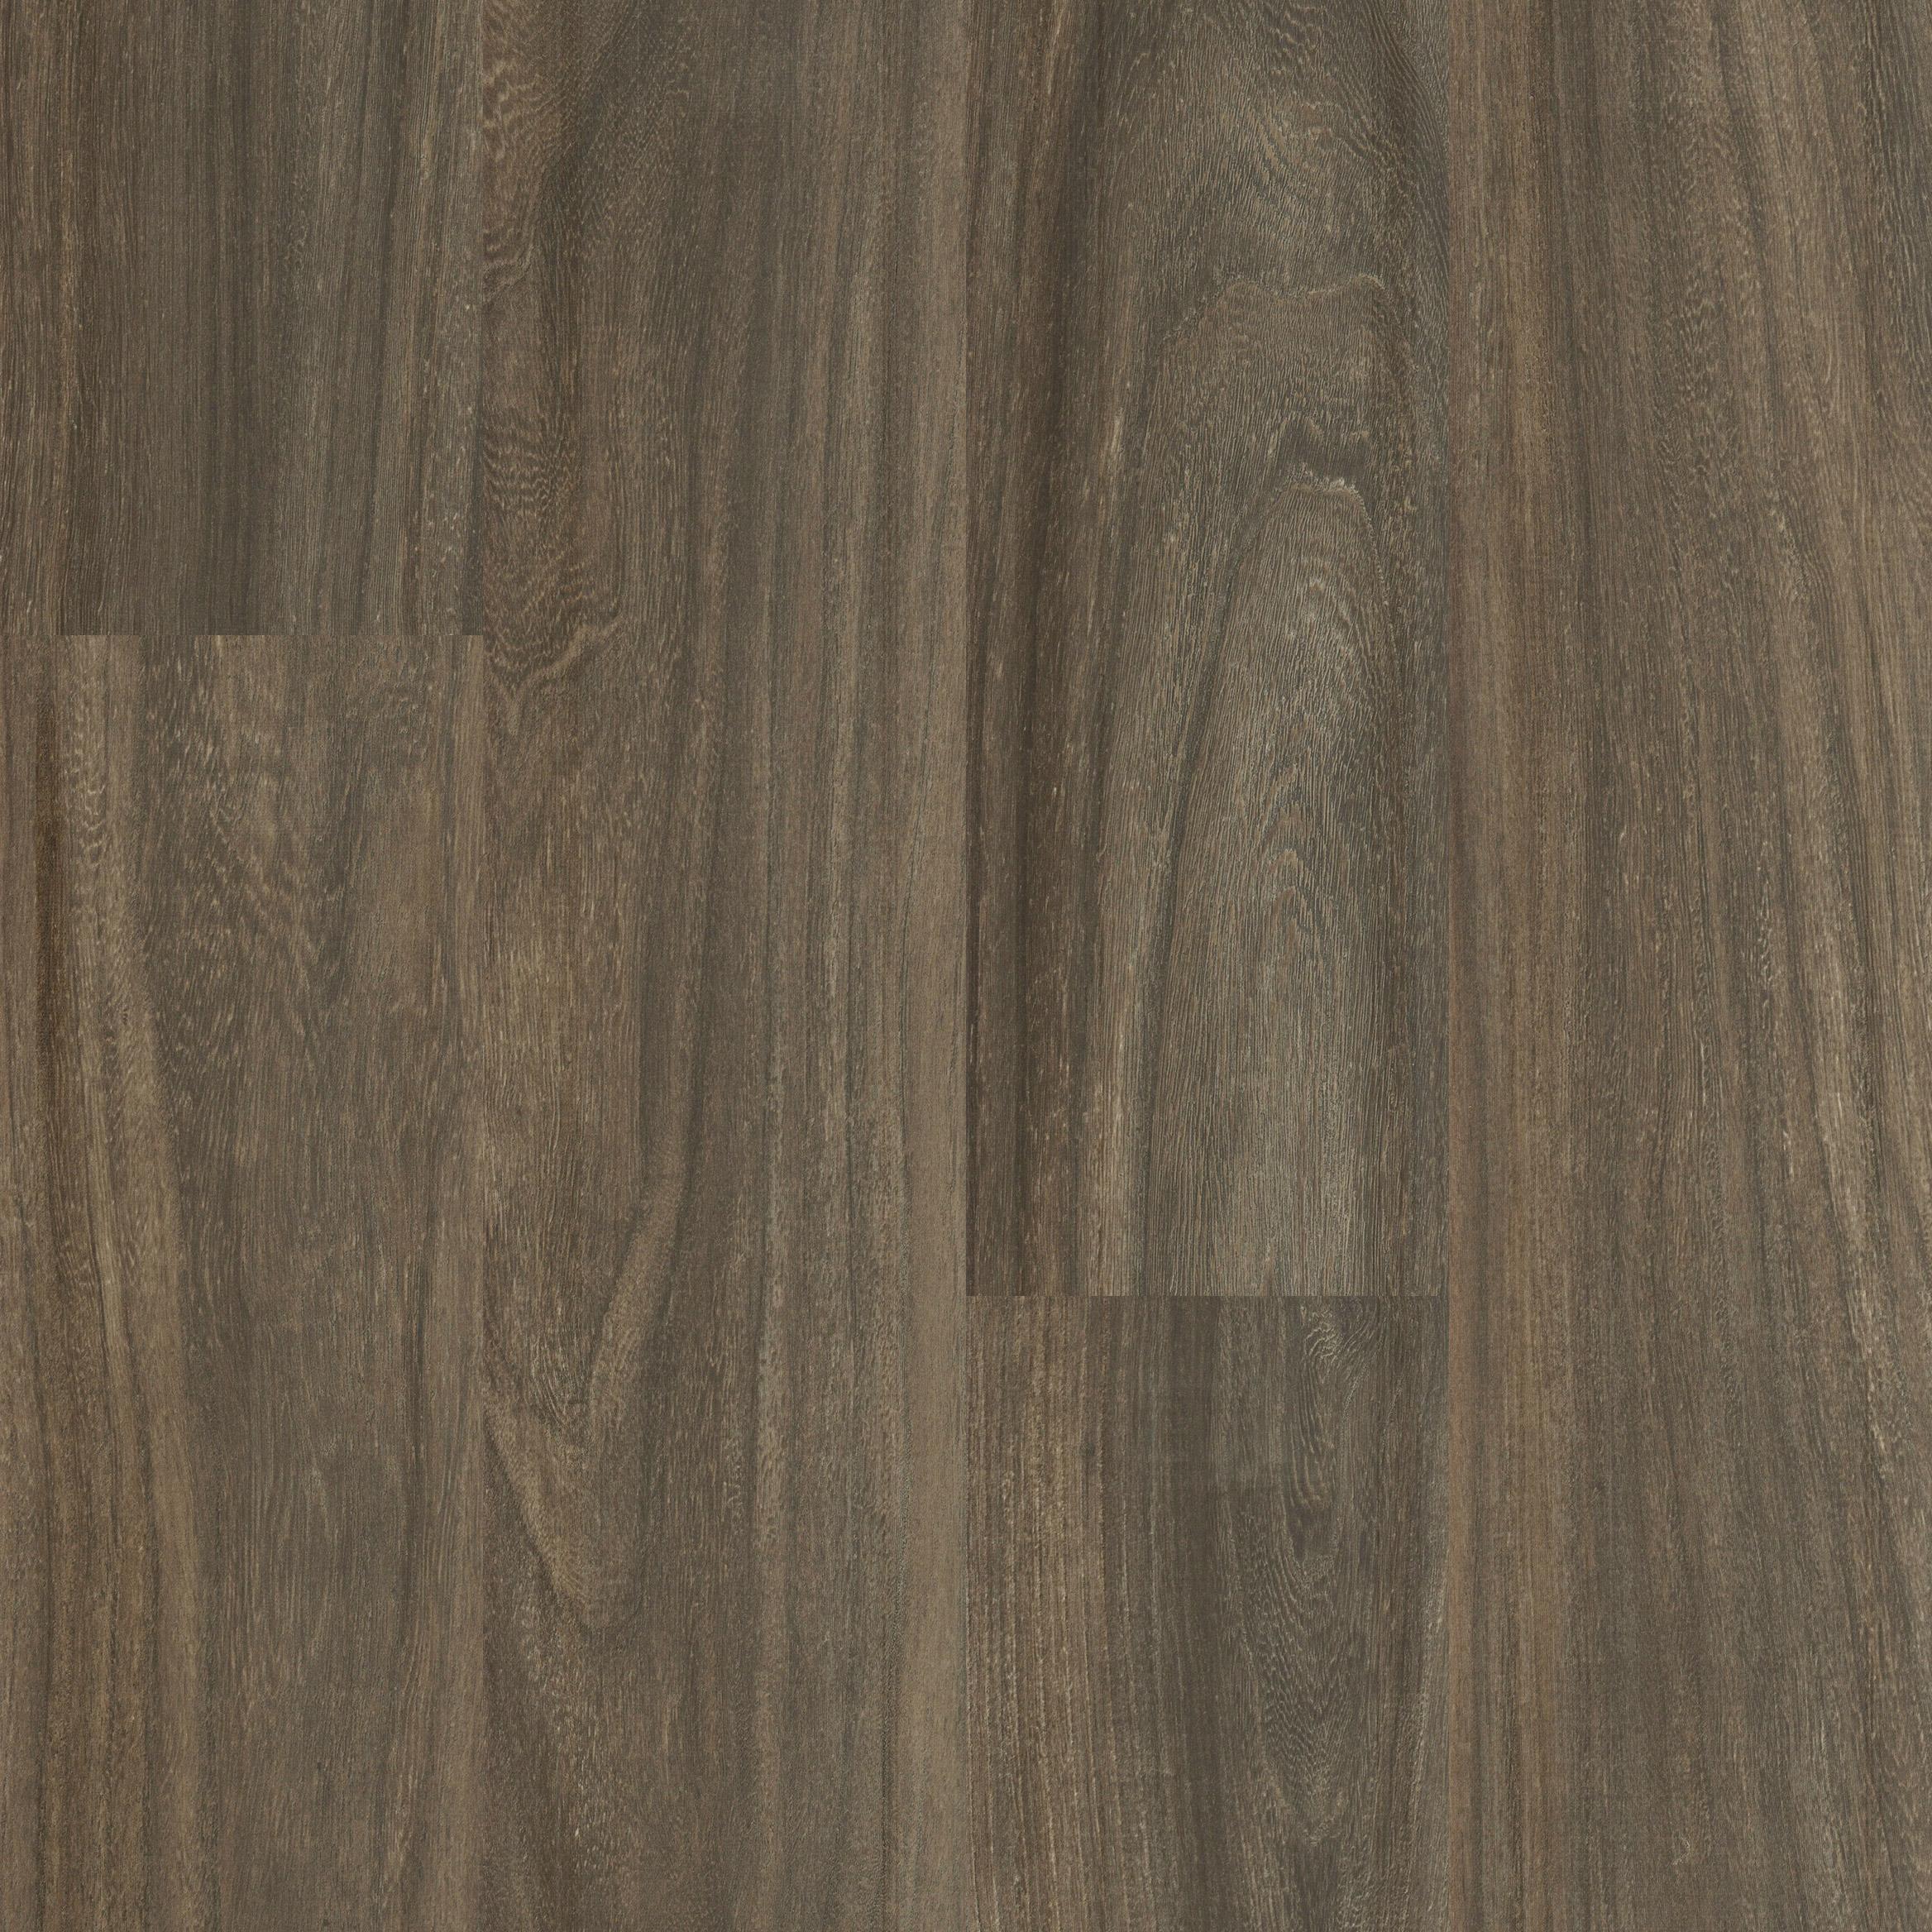 luxury vinyl plank flooring vs engineered hardwood of moduleo vision click together big leaf maple 60068 inside more views ivc liberty plank big leaf maple 6 wide luxury vinyl plank flooring